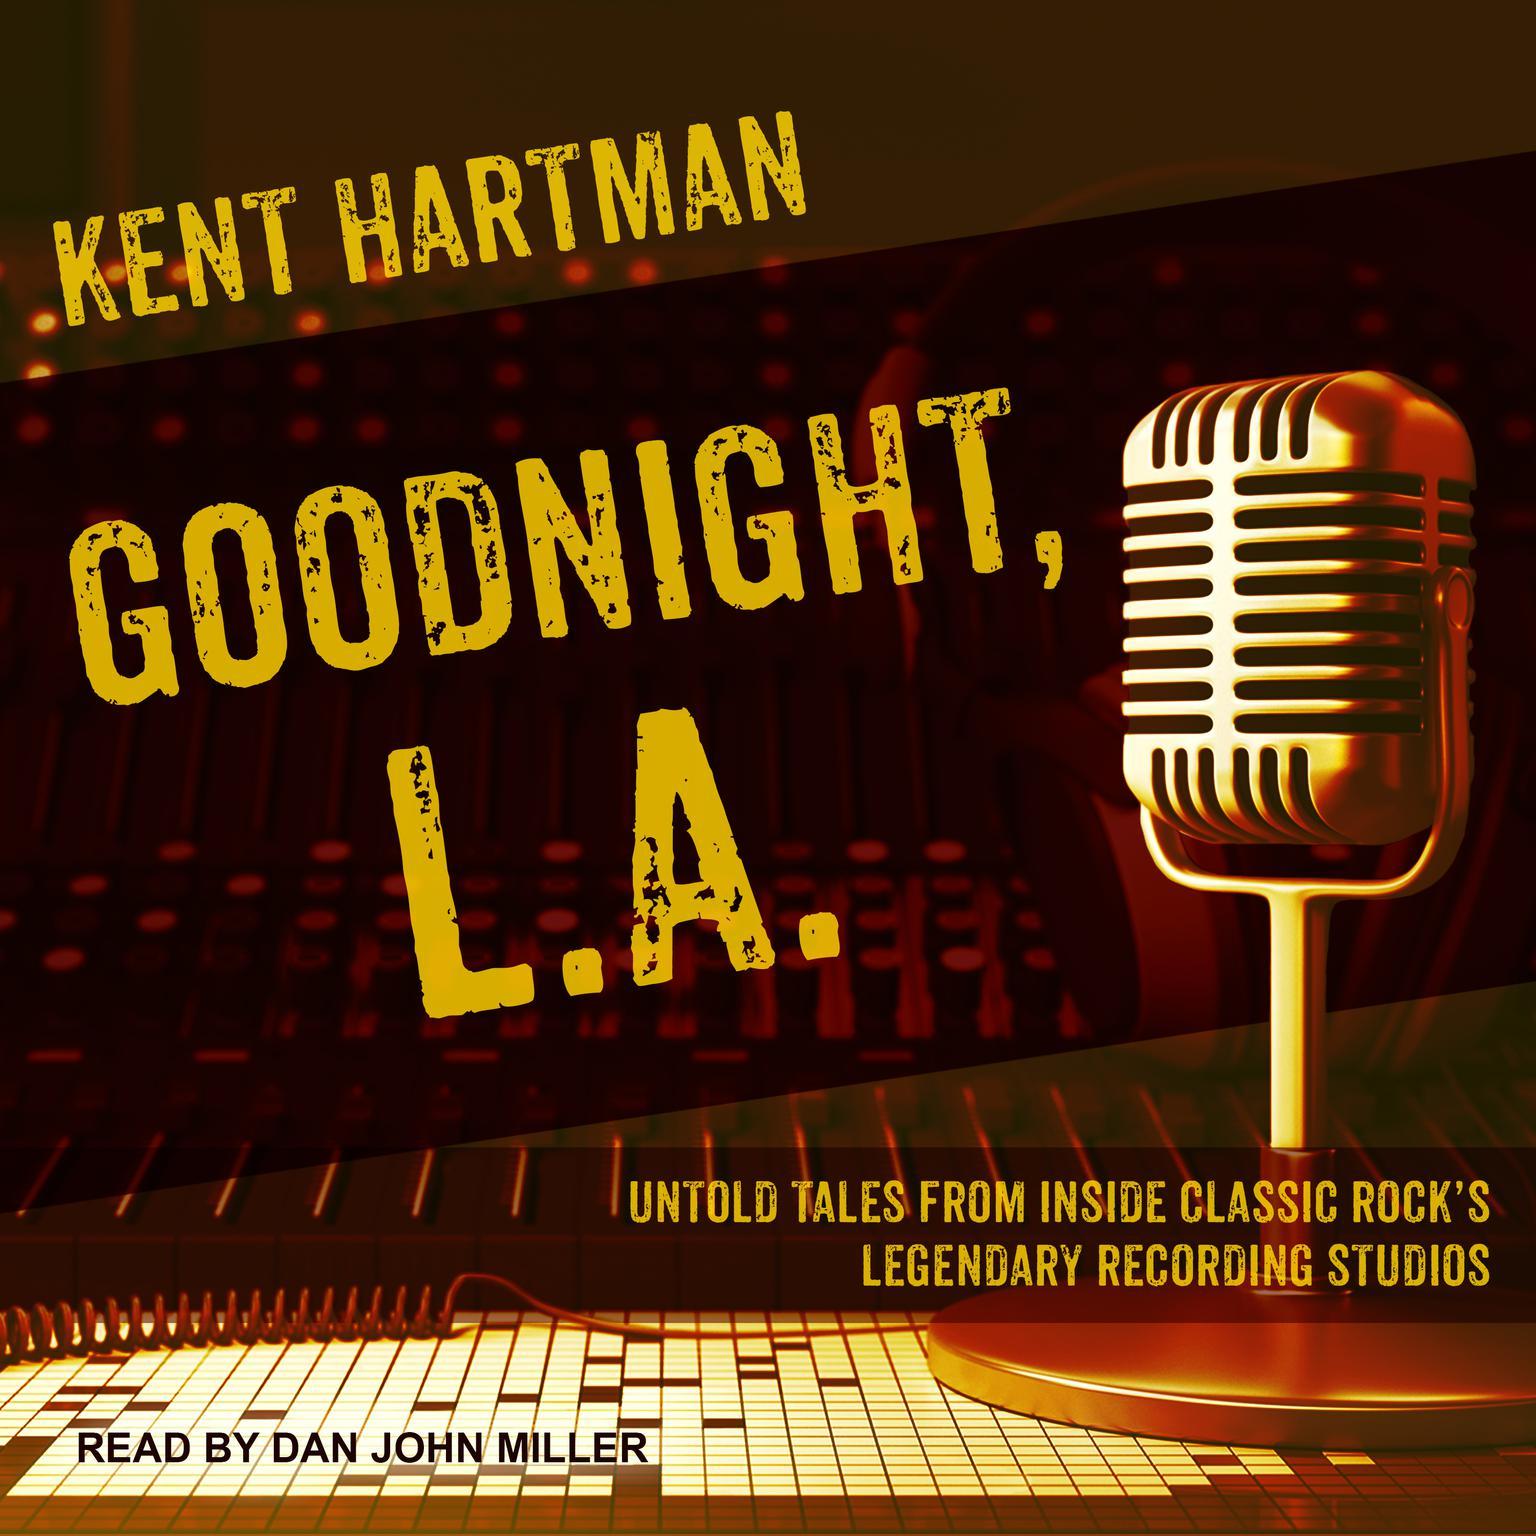 Goodnight, L.A.: Untold Tales from Inside Classic Rock's Legendary Recording Studios Audiobook, by Kent Hartman